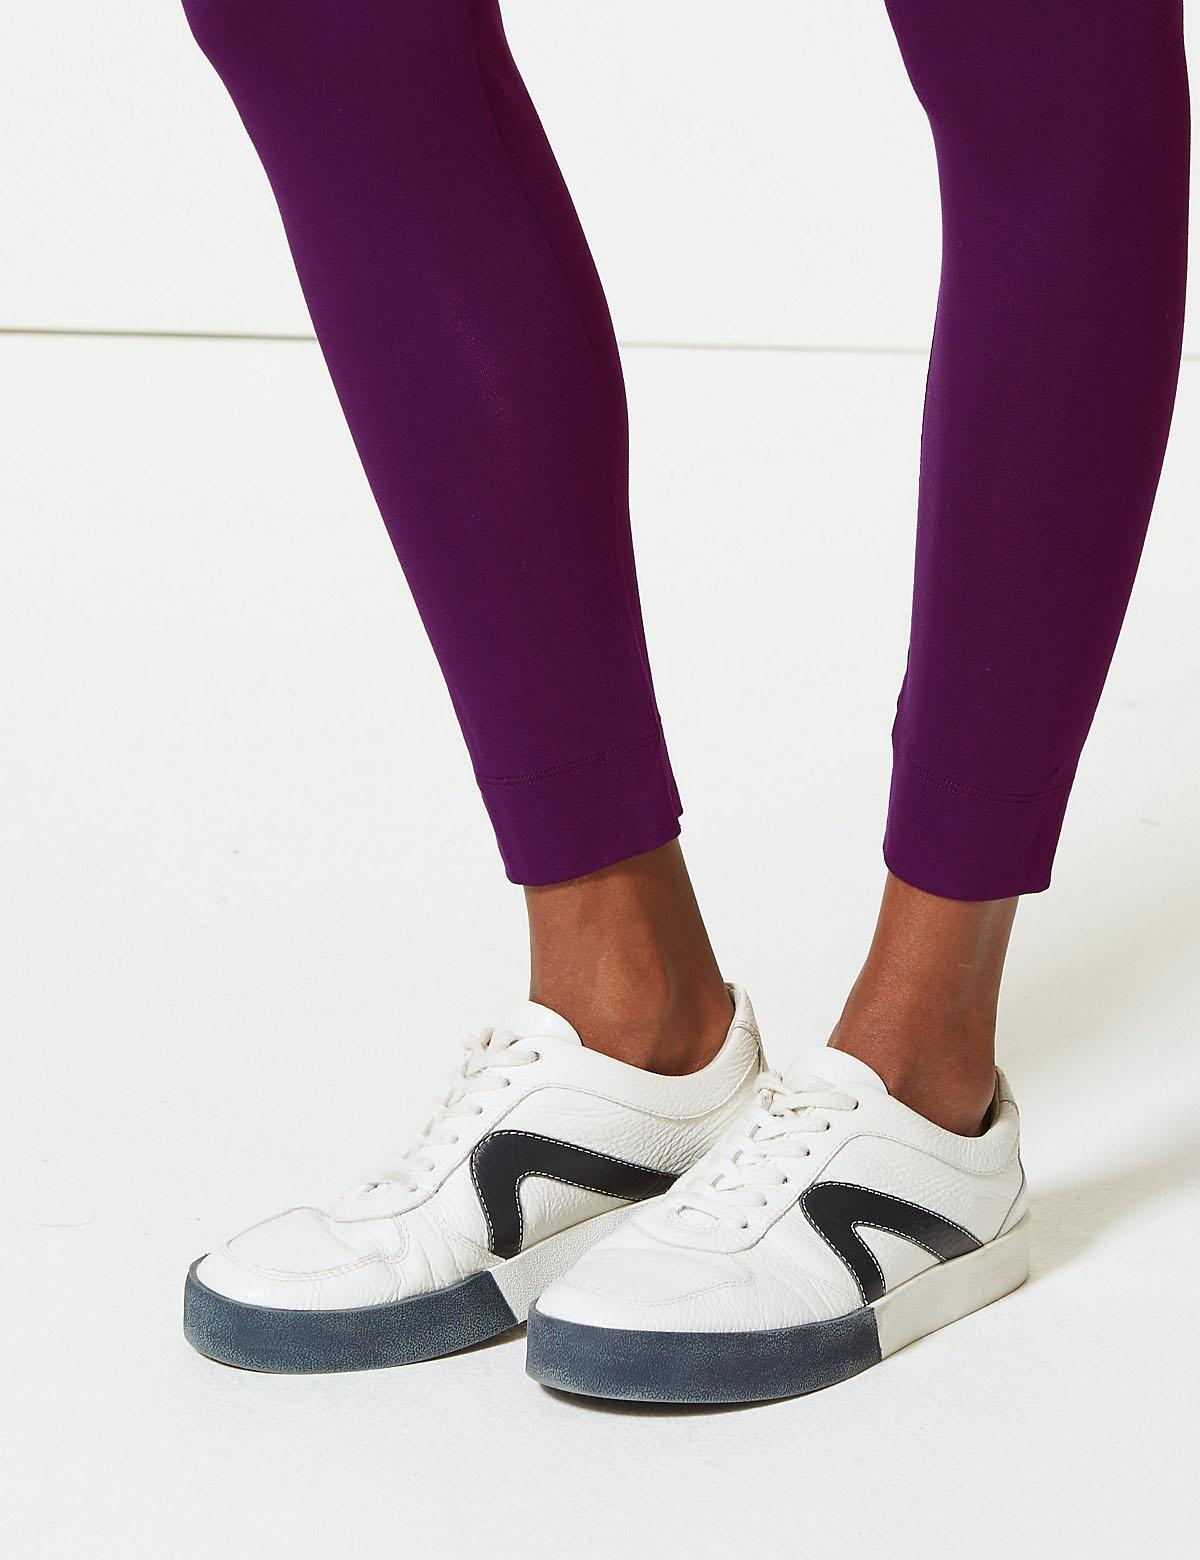 Ex-M-amp-S-Leggings-Azul-marino-Berry-Gris-Carbon-Negro-Marks-amp-Spencer-Talla-6-24 miniatura 30